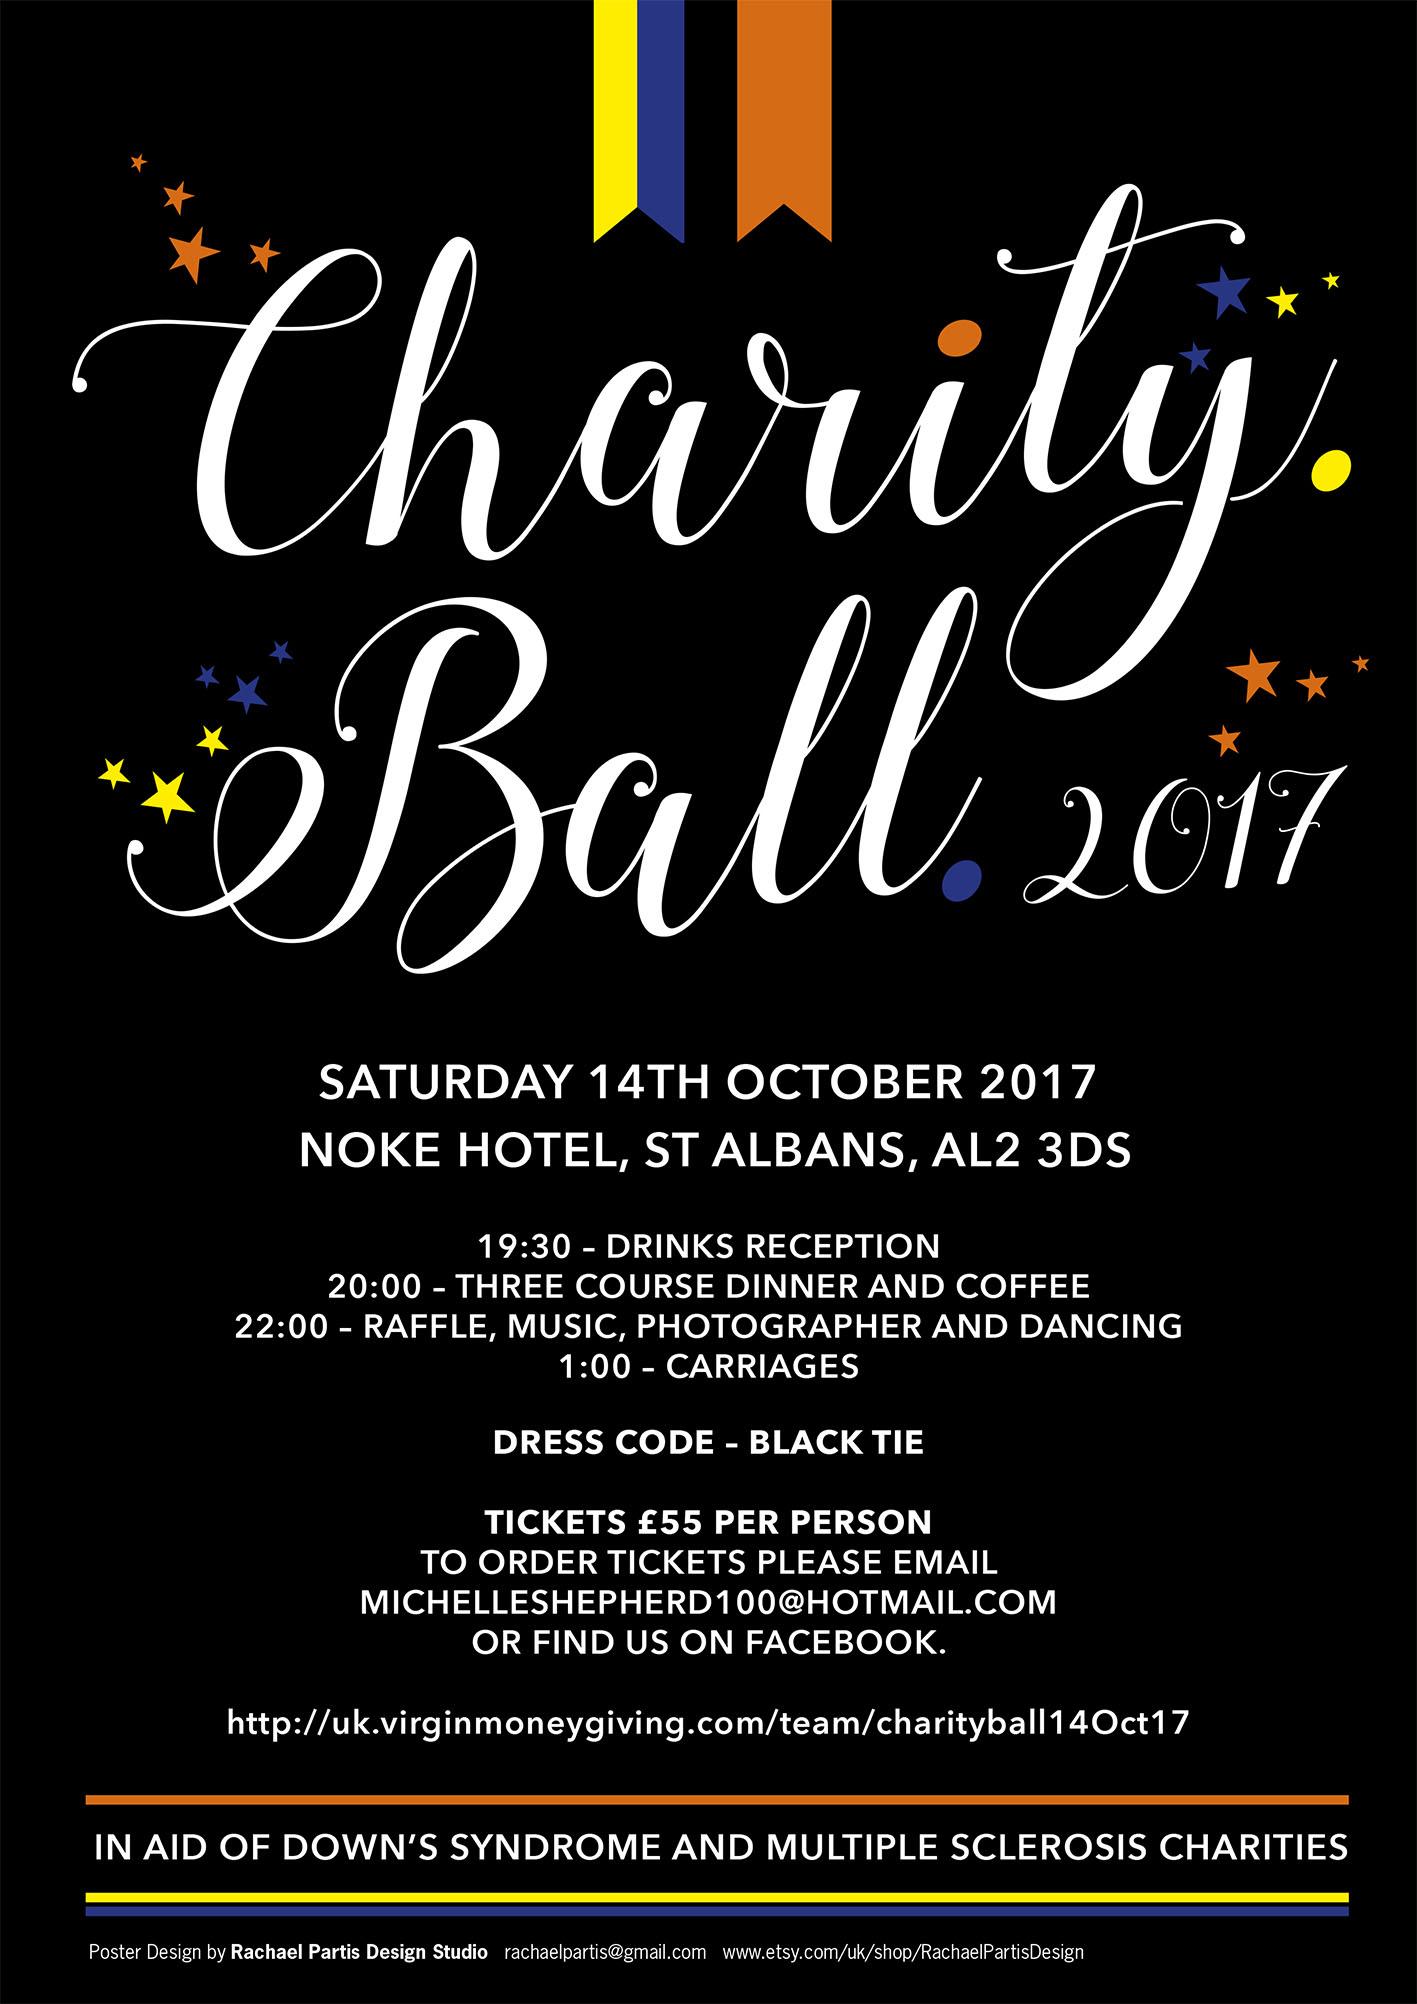 Charity Ball poster - Copy.jpg